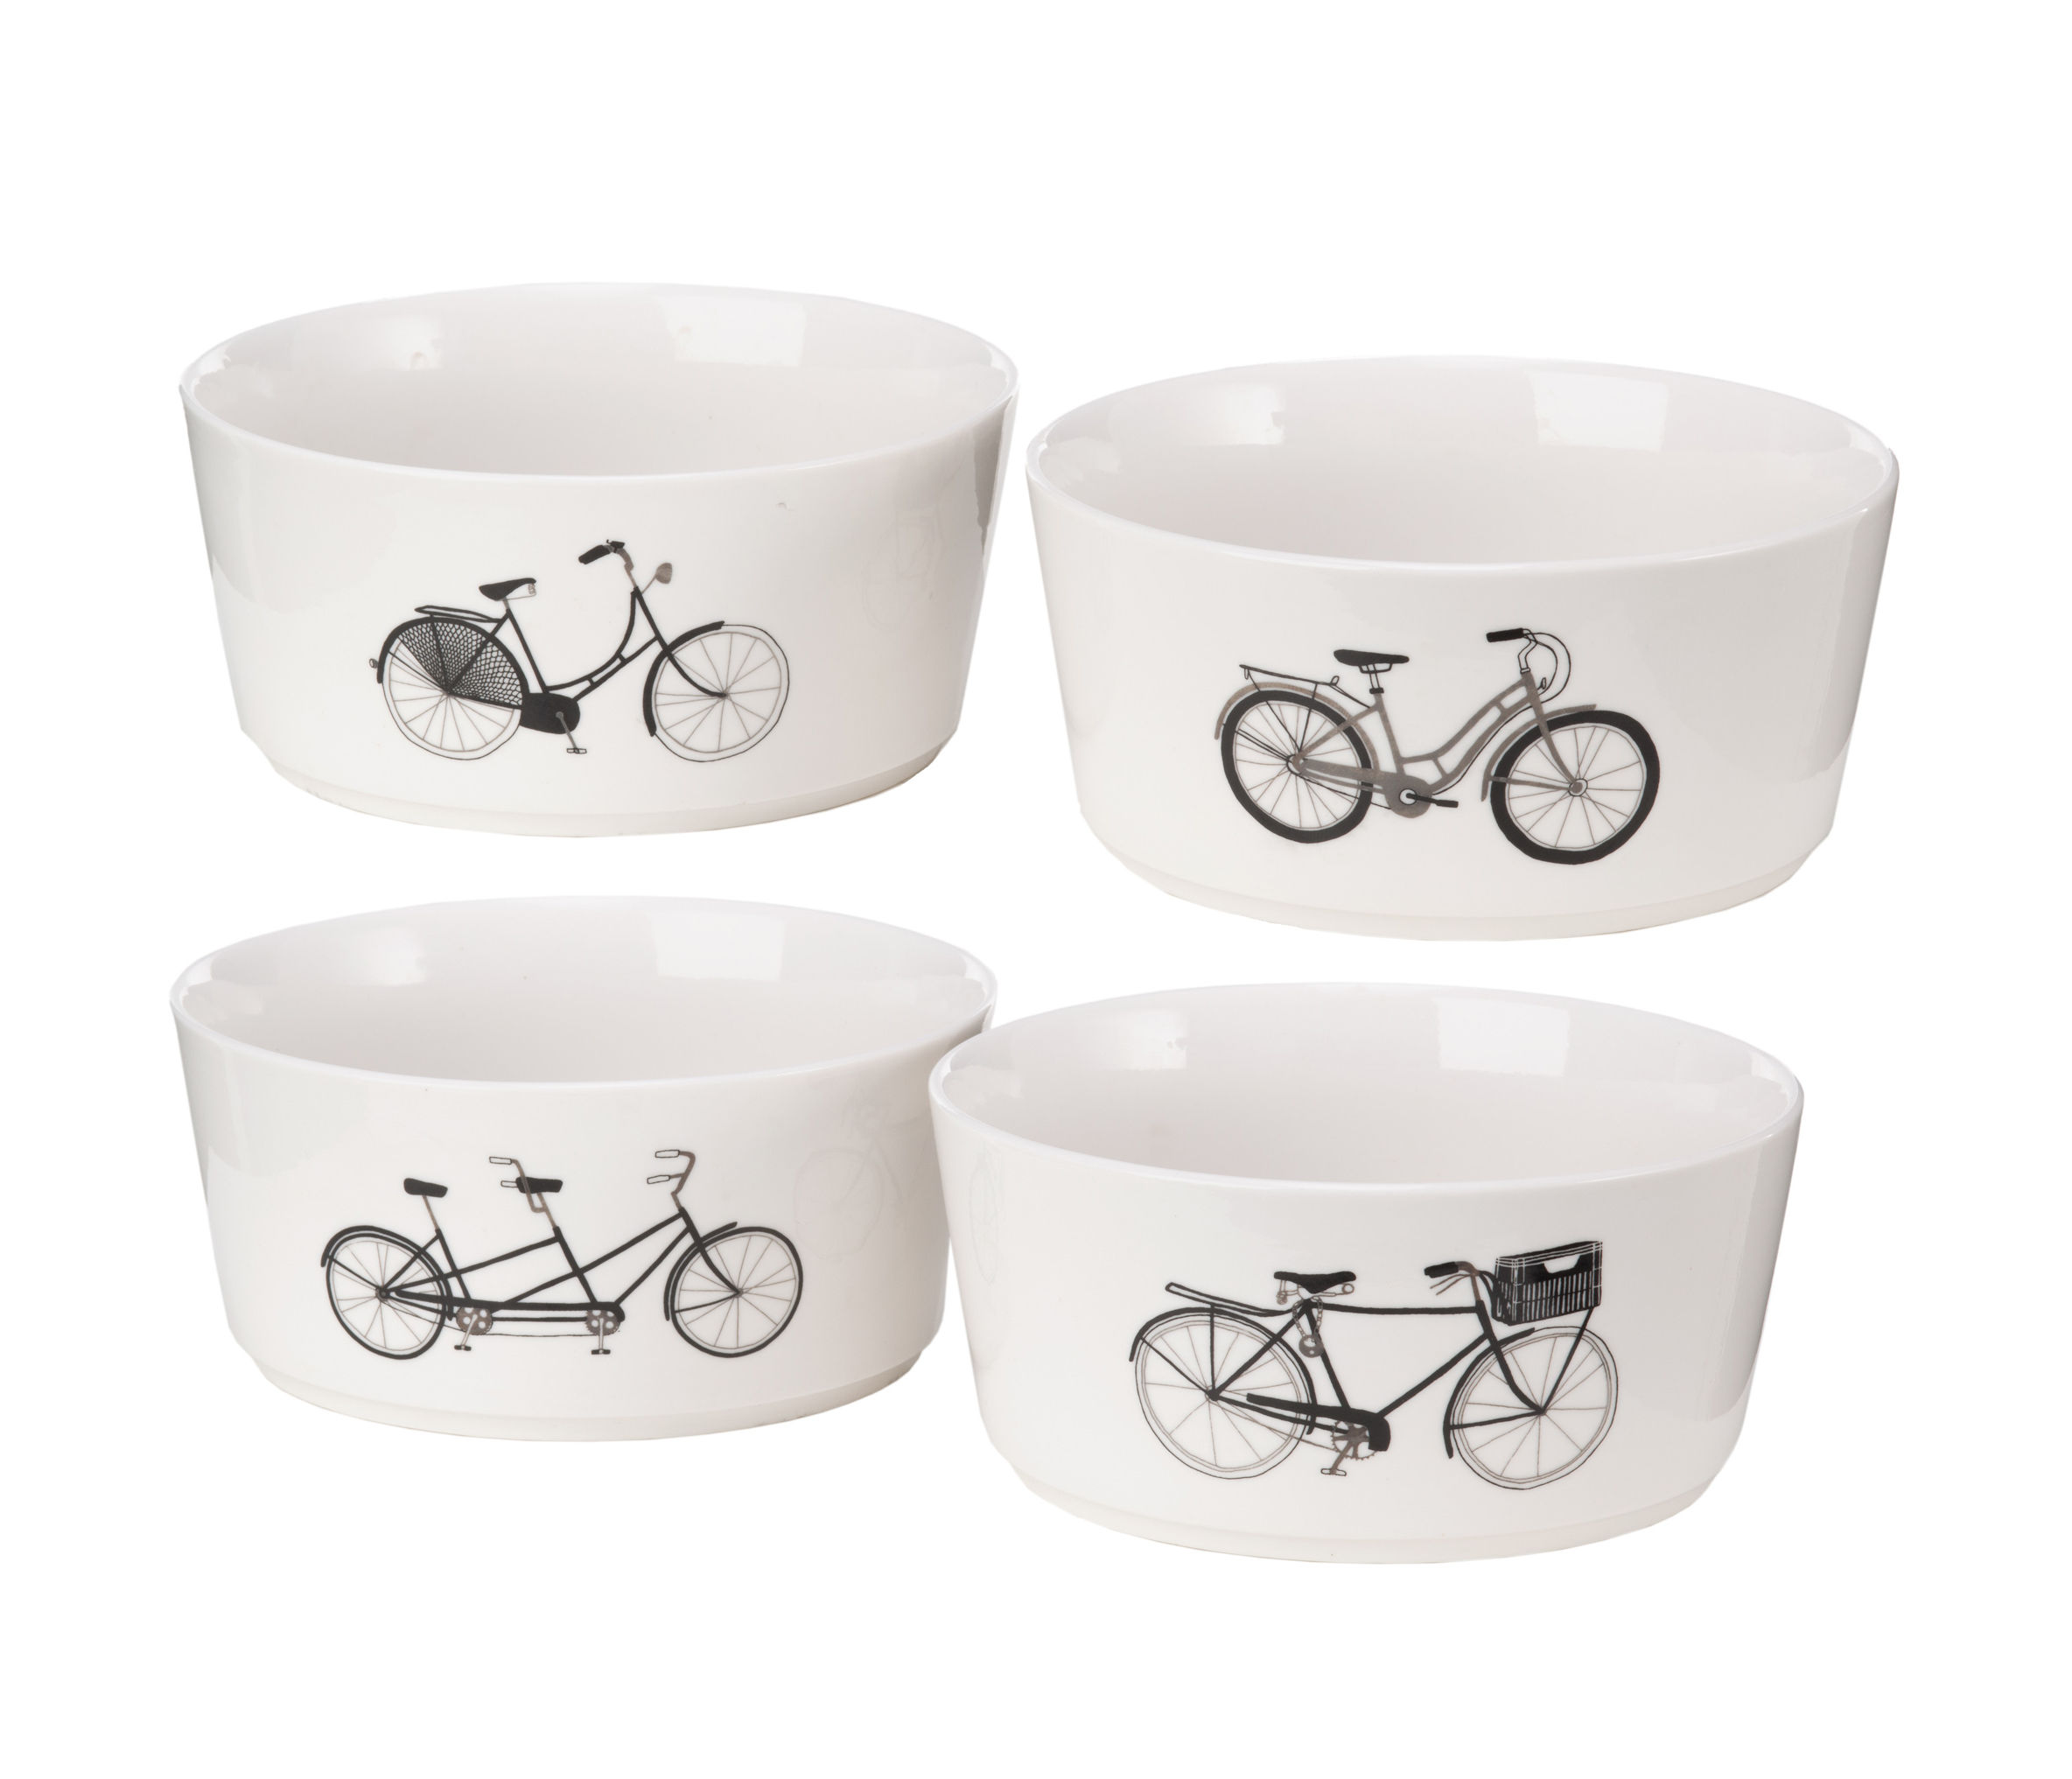 Tableware - Bowls - Bikes Bowl - / Set of 4 - Porcelain by Pols Potten - Black, white & silver - Porcelaine vitrifiée